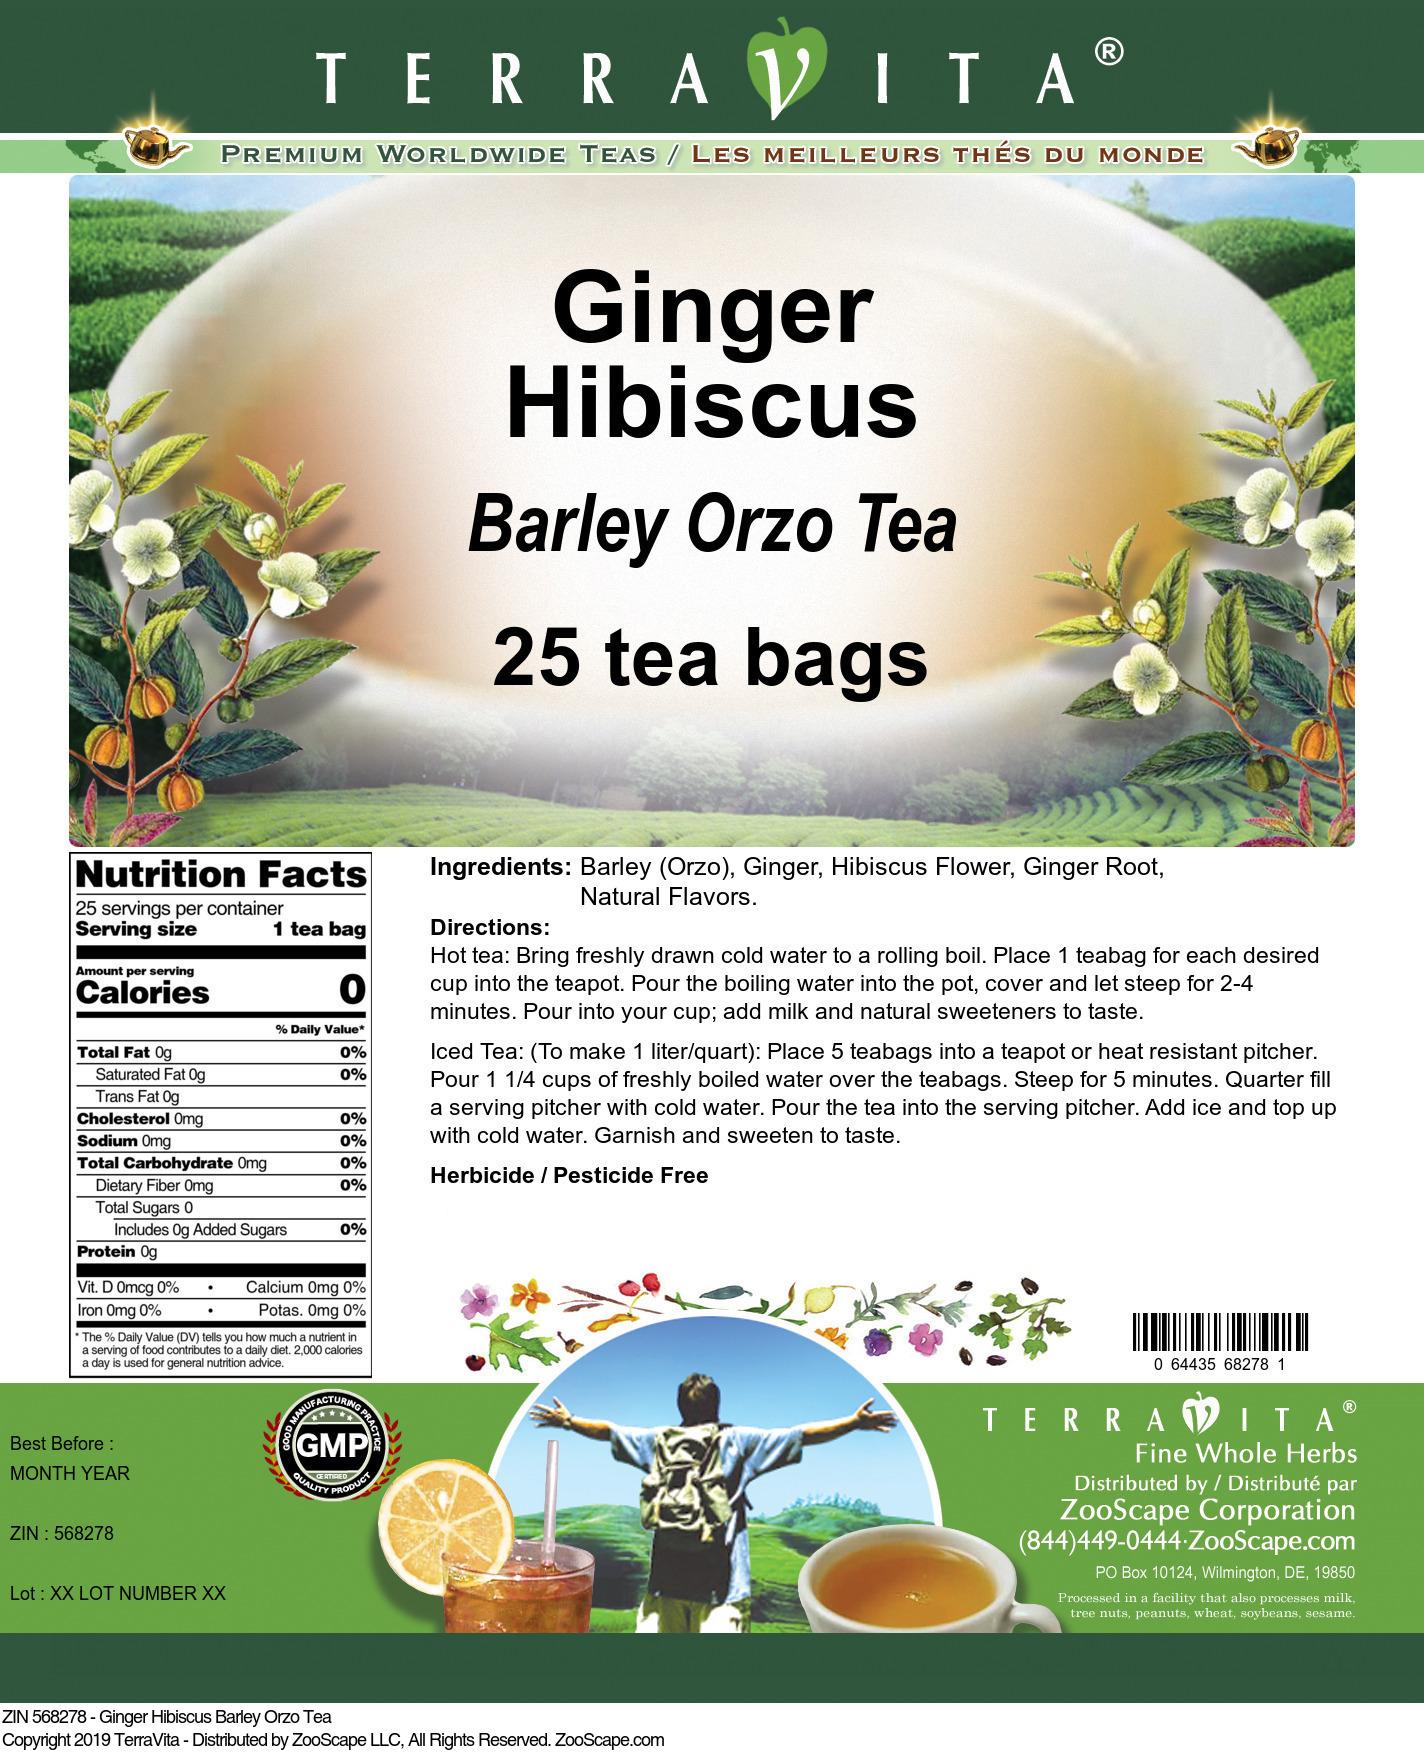 Ginger Hibiscus Barley Orzo